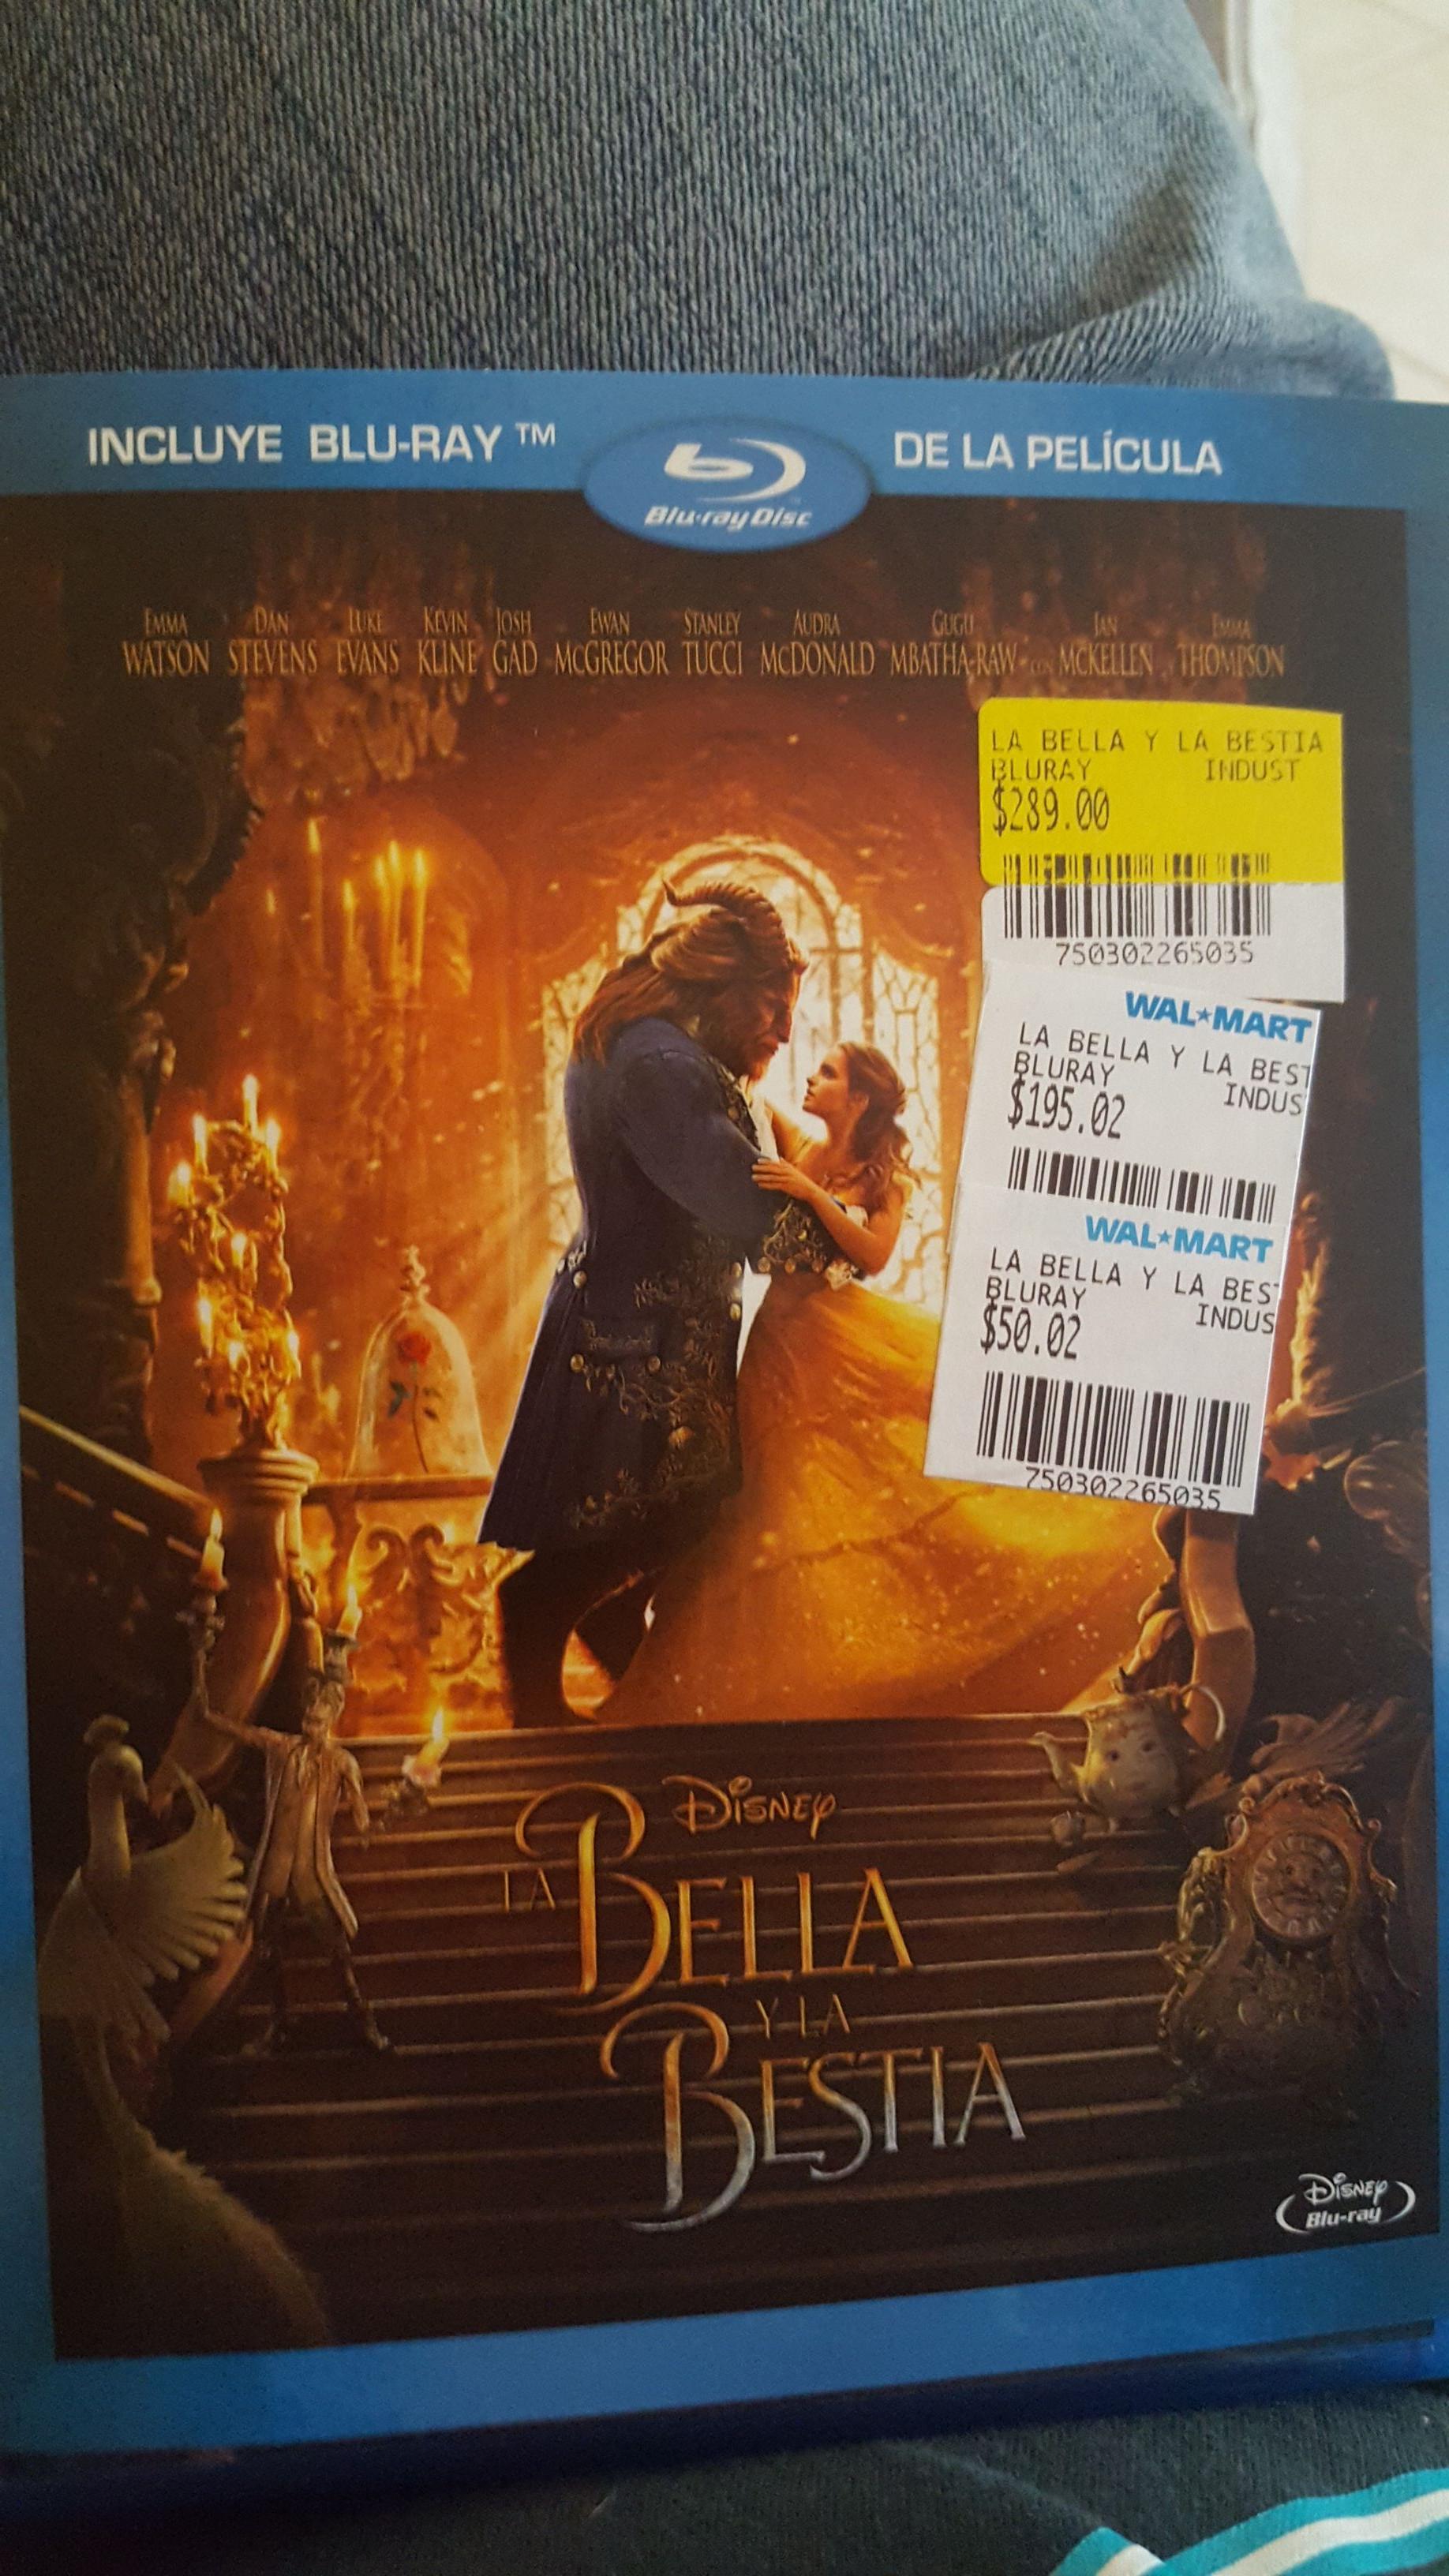 Walmart Mexico 68: Bluray La Bella & La Bestia